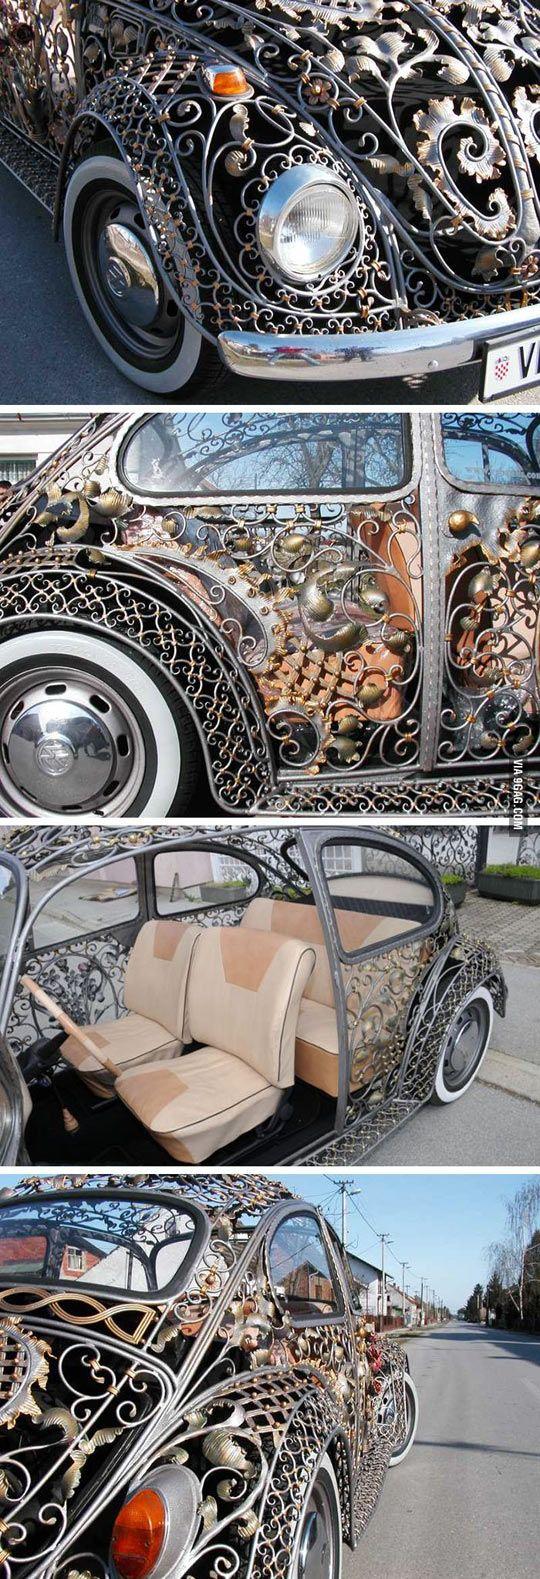 cool-bug-car-metalwork-body.jpg (540×1579)